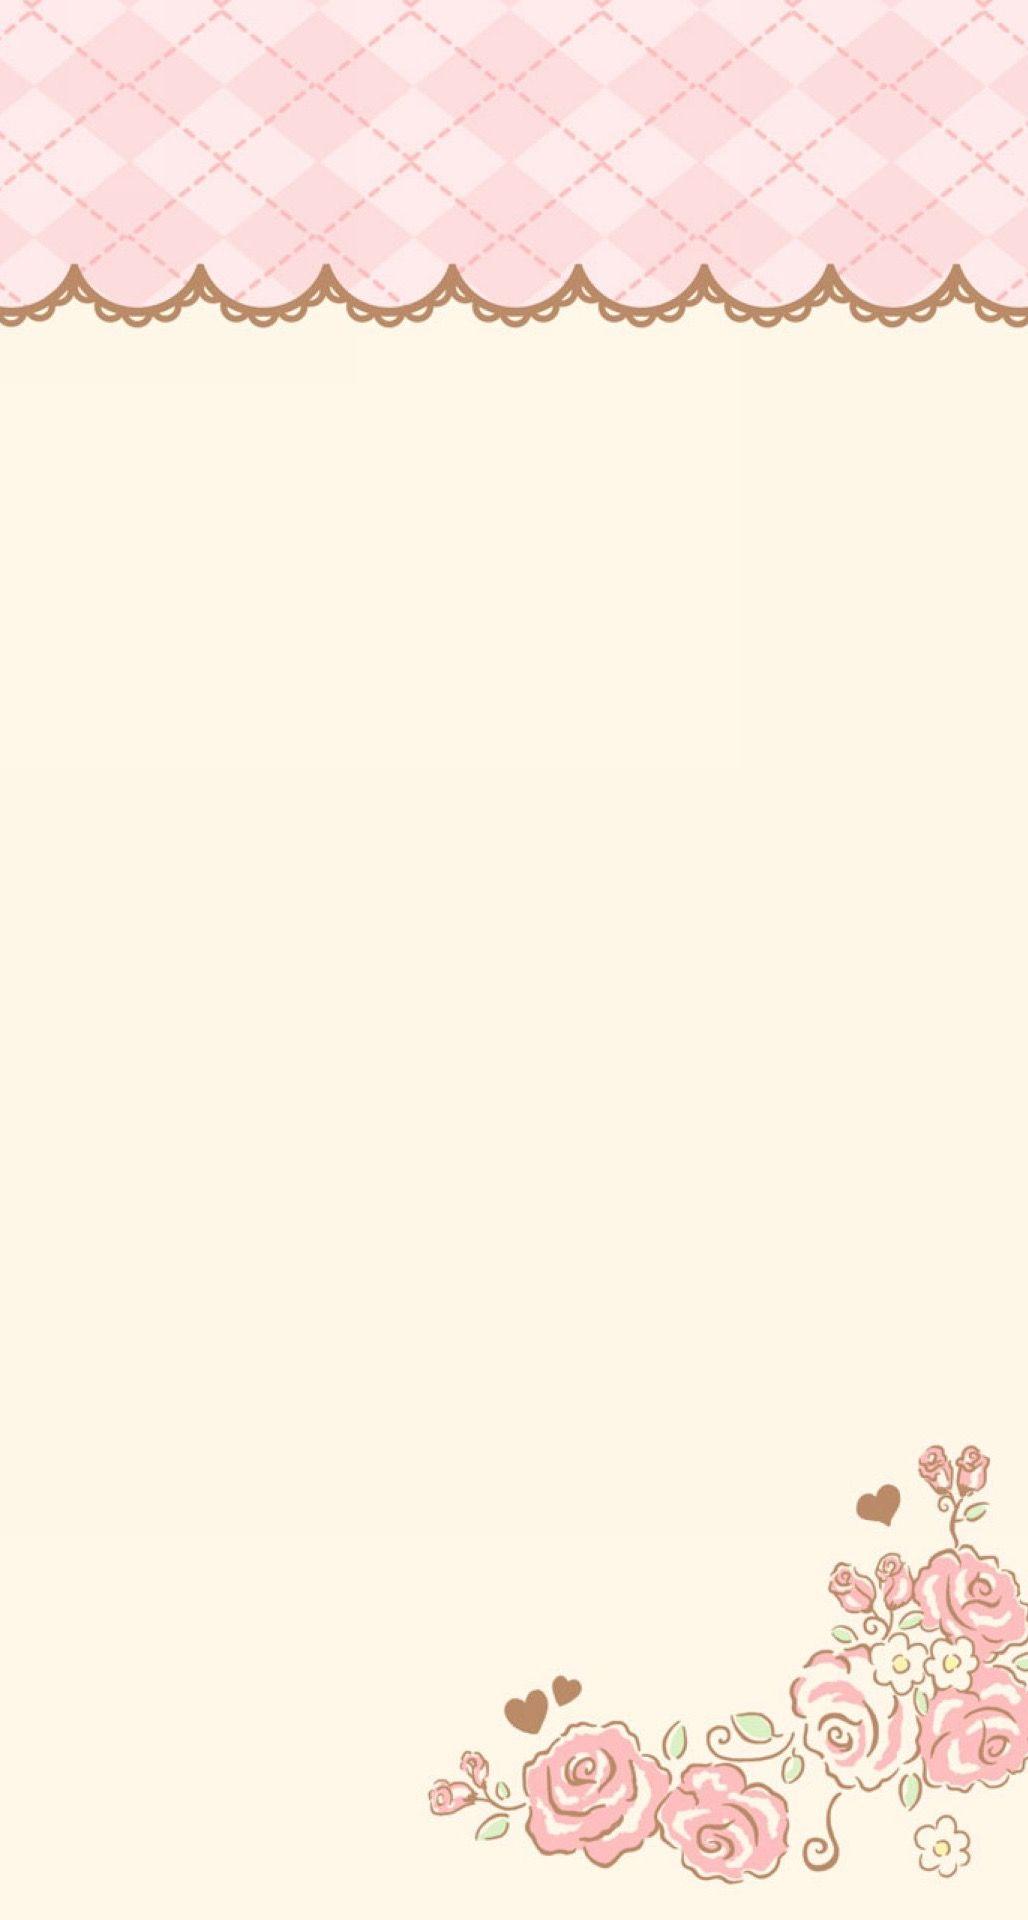 Pin de Dream Rose en new   Pinterest   Fondos, Papel decorativo y ...